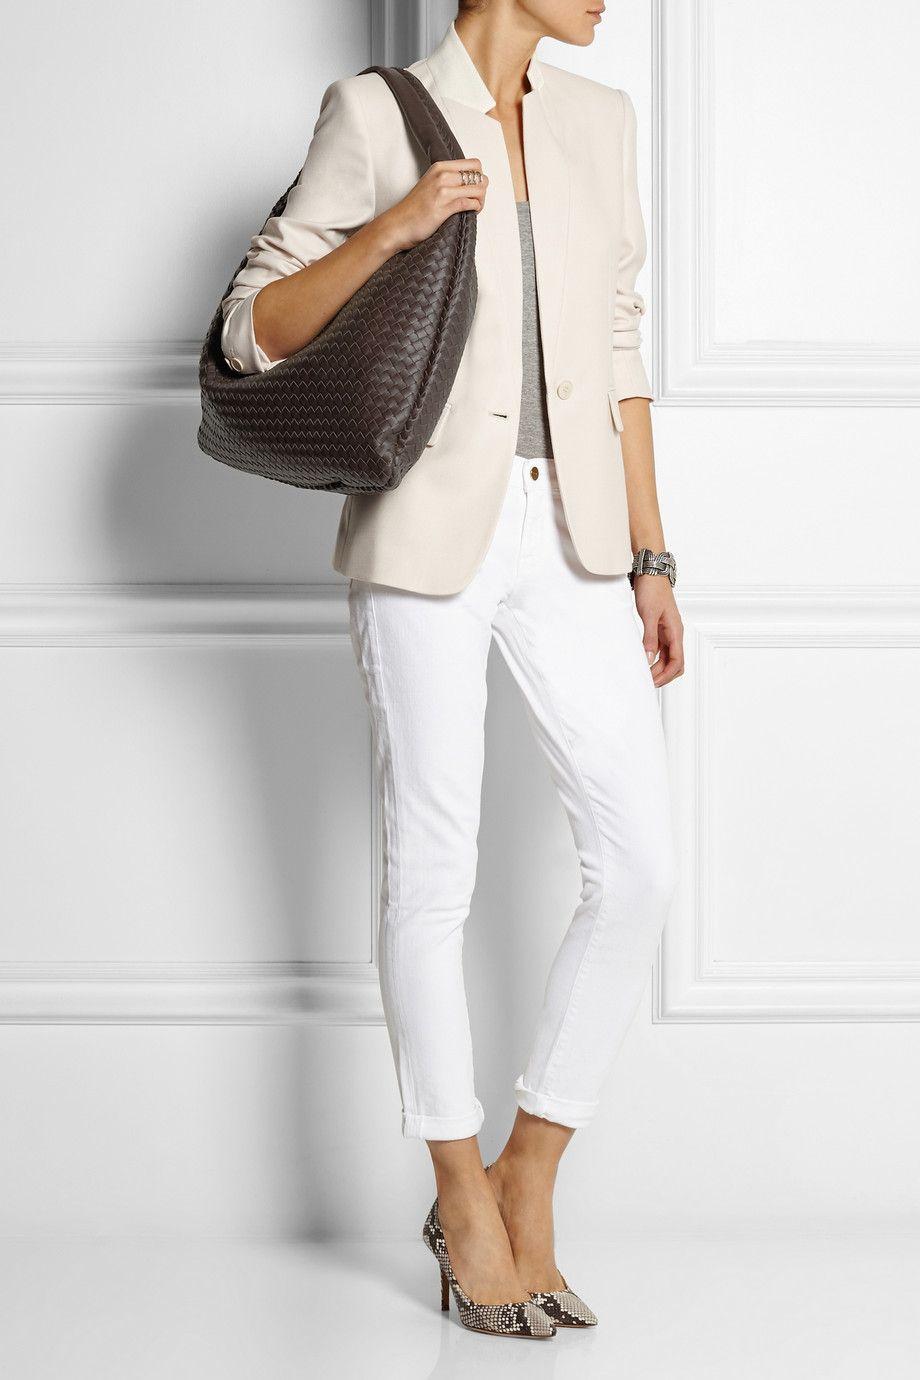 871e2785baf6 ... Bottega Veneta Maxi Veneta intrecciato leather shoulder bag  NET-A-PORTER.